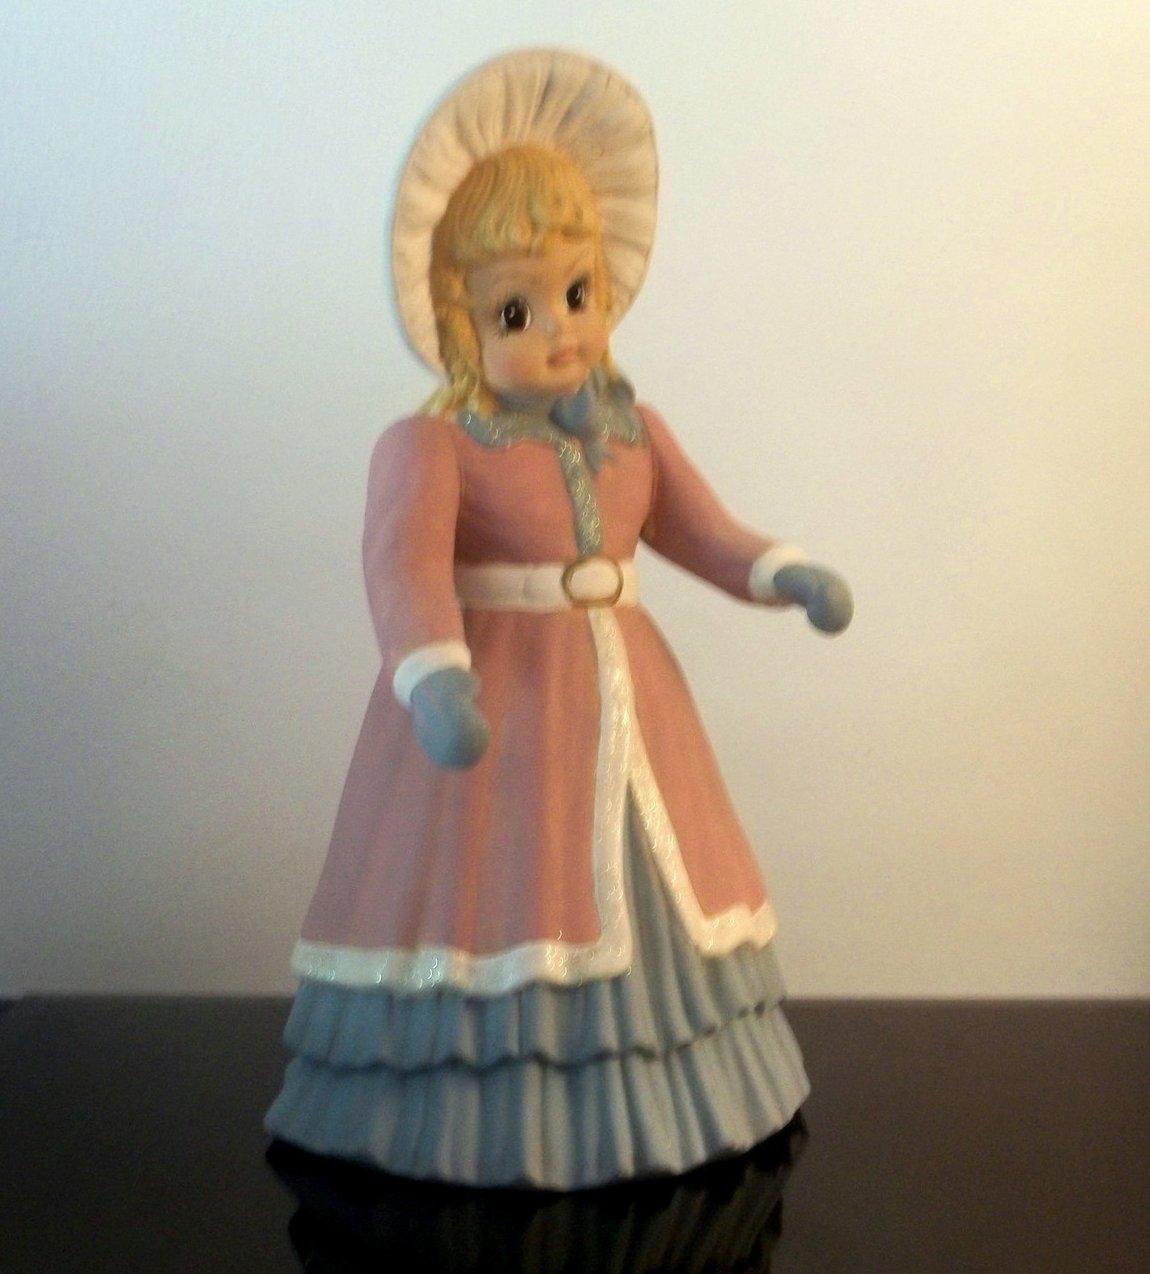 Vintage Christmas Caroler Noelle 13.5 inch Sugarplum Collection